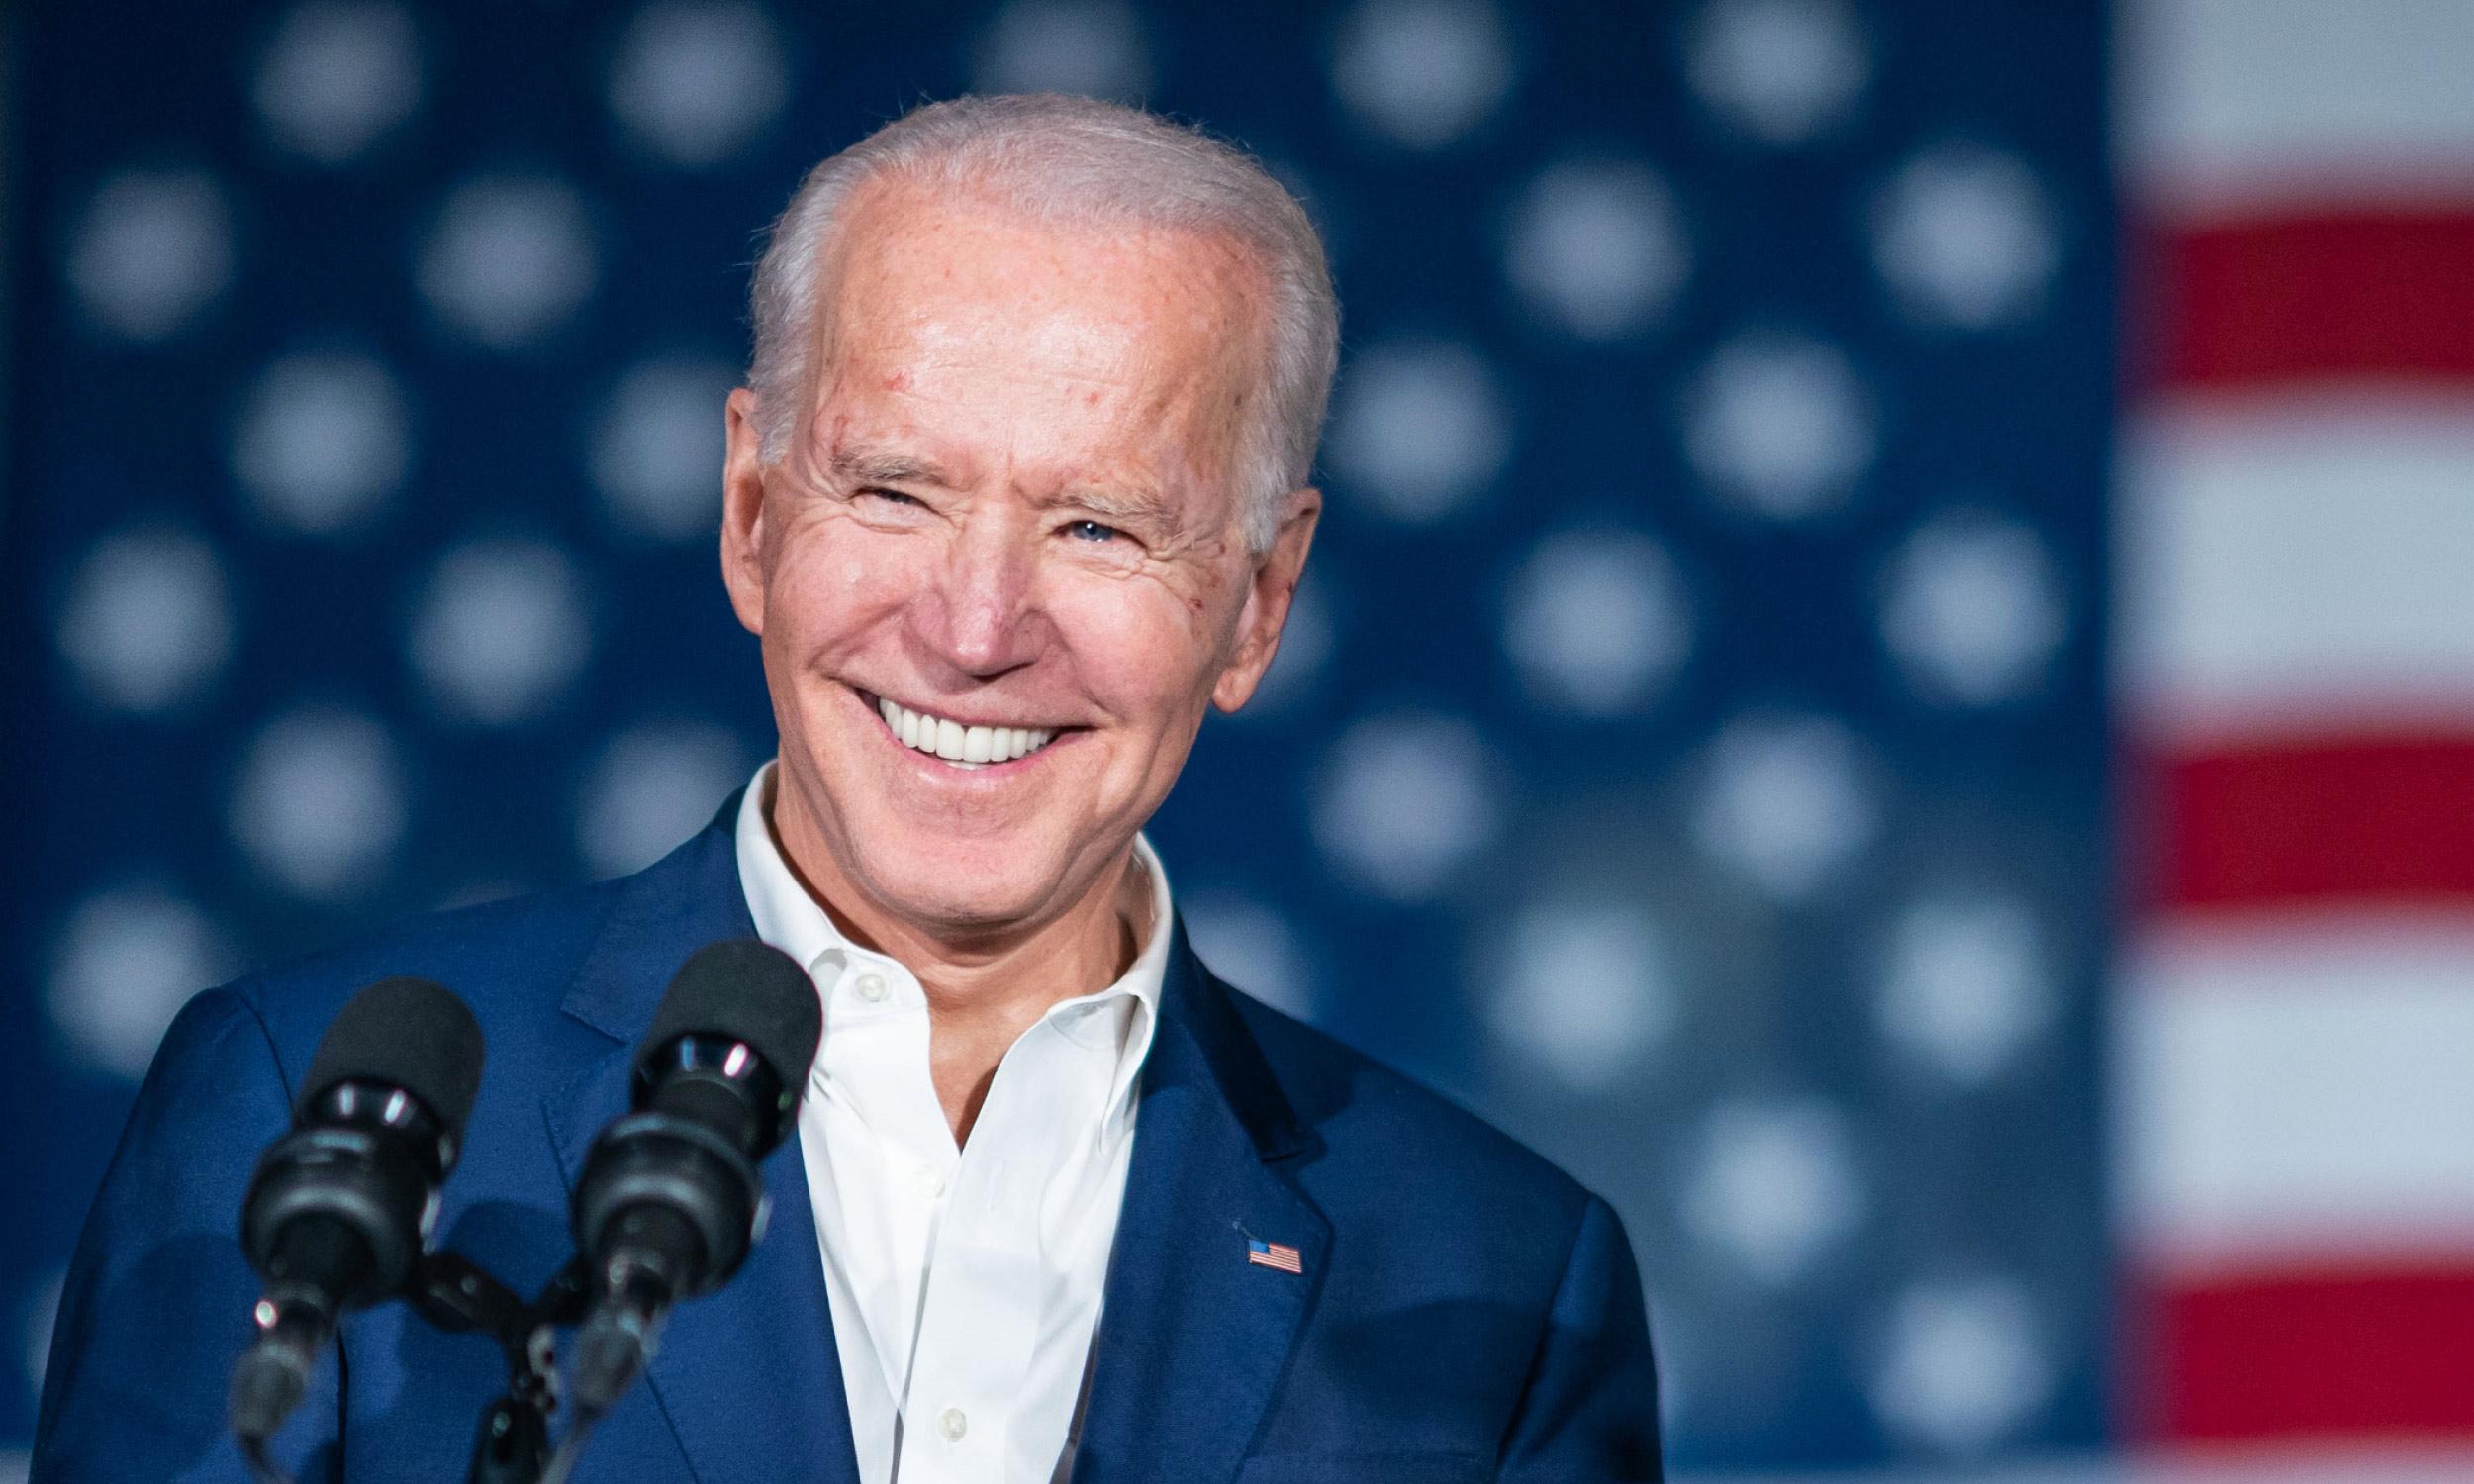 Joe Biden introduced the US stimulus package